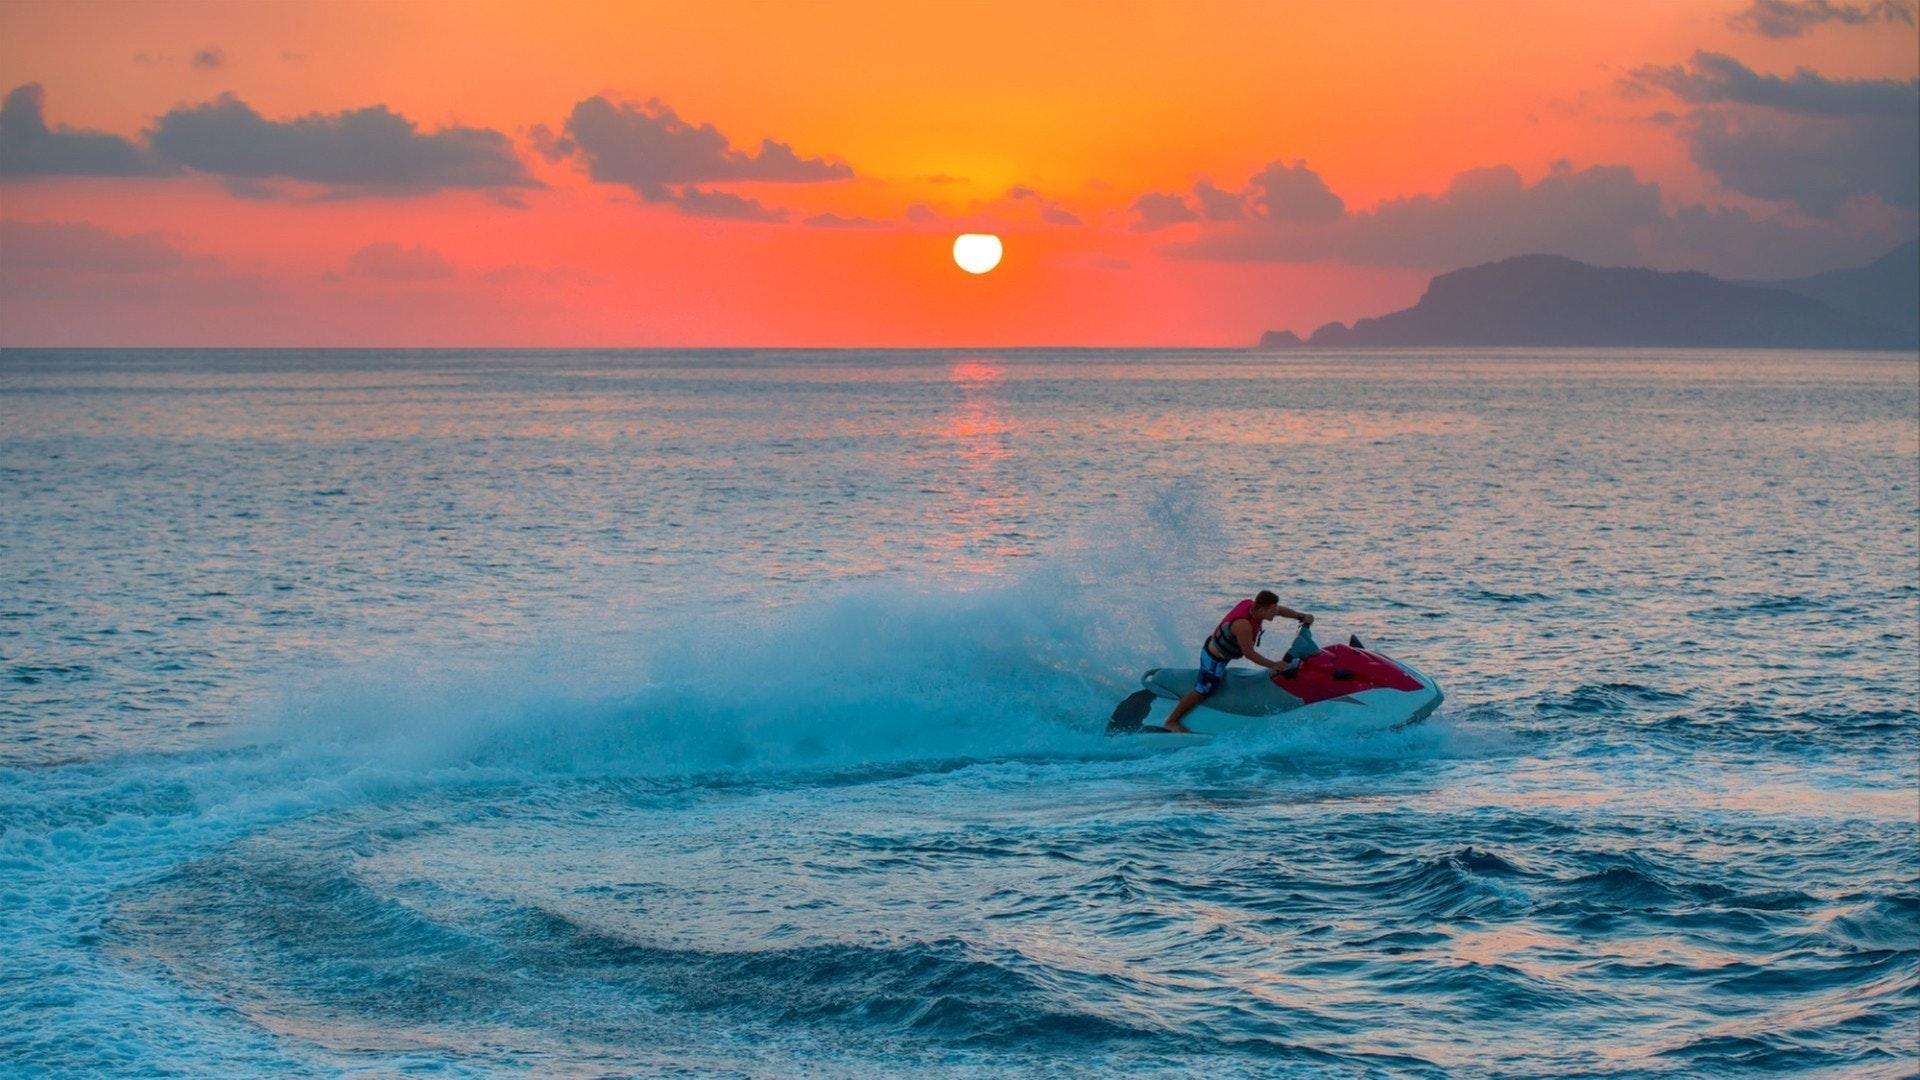 Homem em jetski salto na onda ao pôr do sol, Alanya Turquia